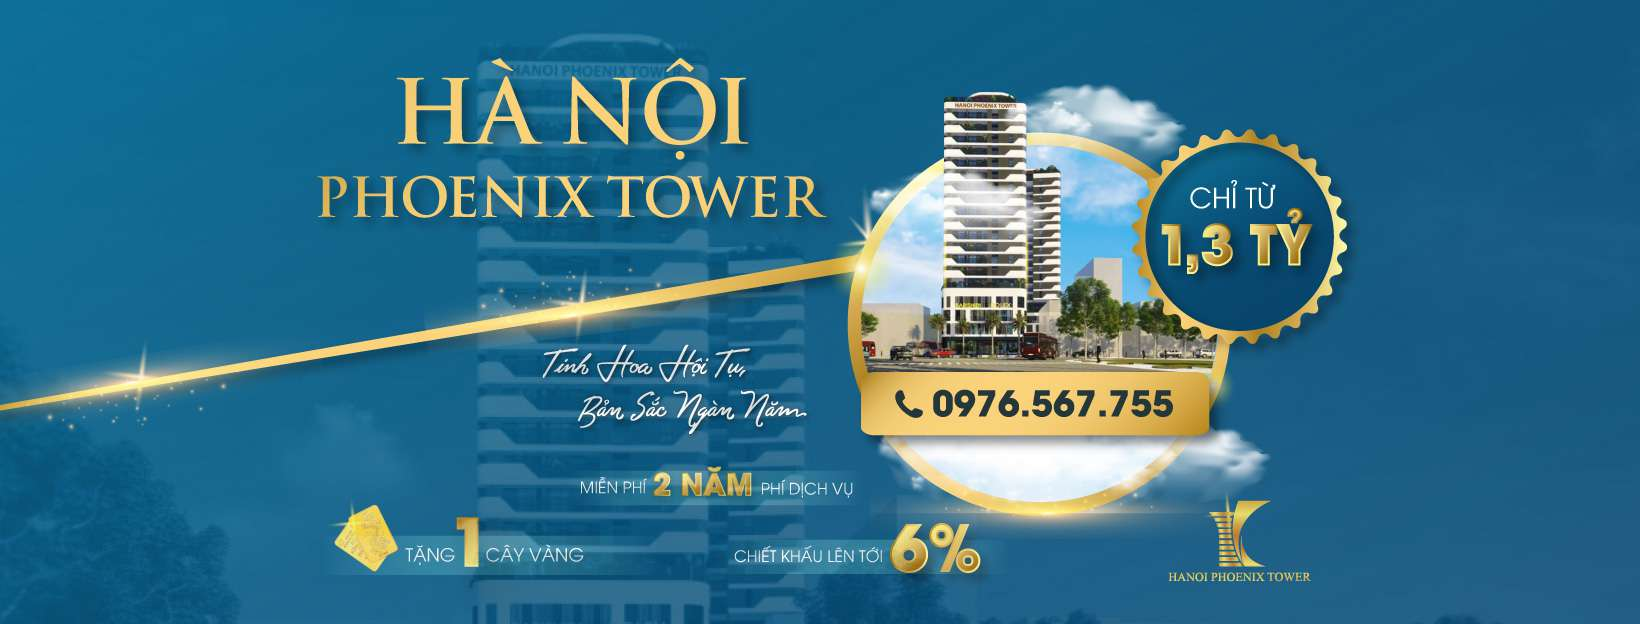 chinh sach ban hang hanoi phoenix tower